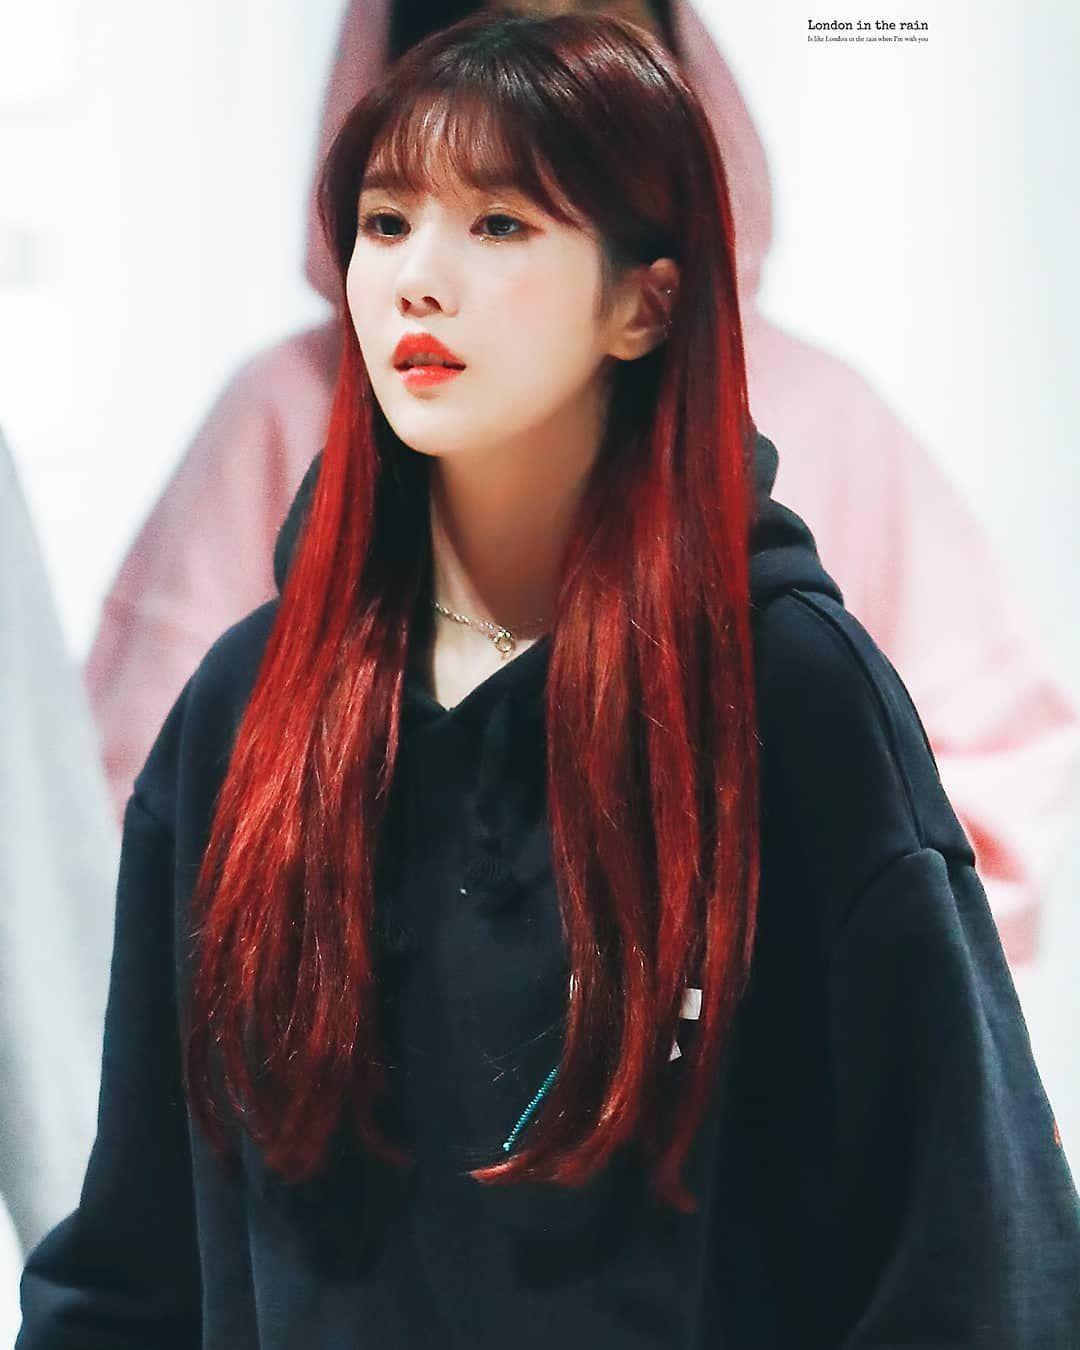 Kwon Eunbi | Gadis korea, Kecantikan, Profil